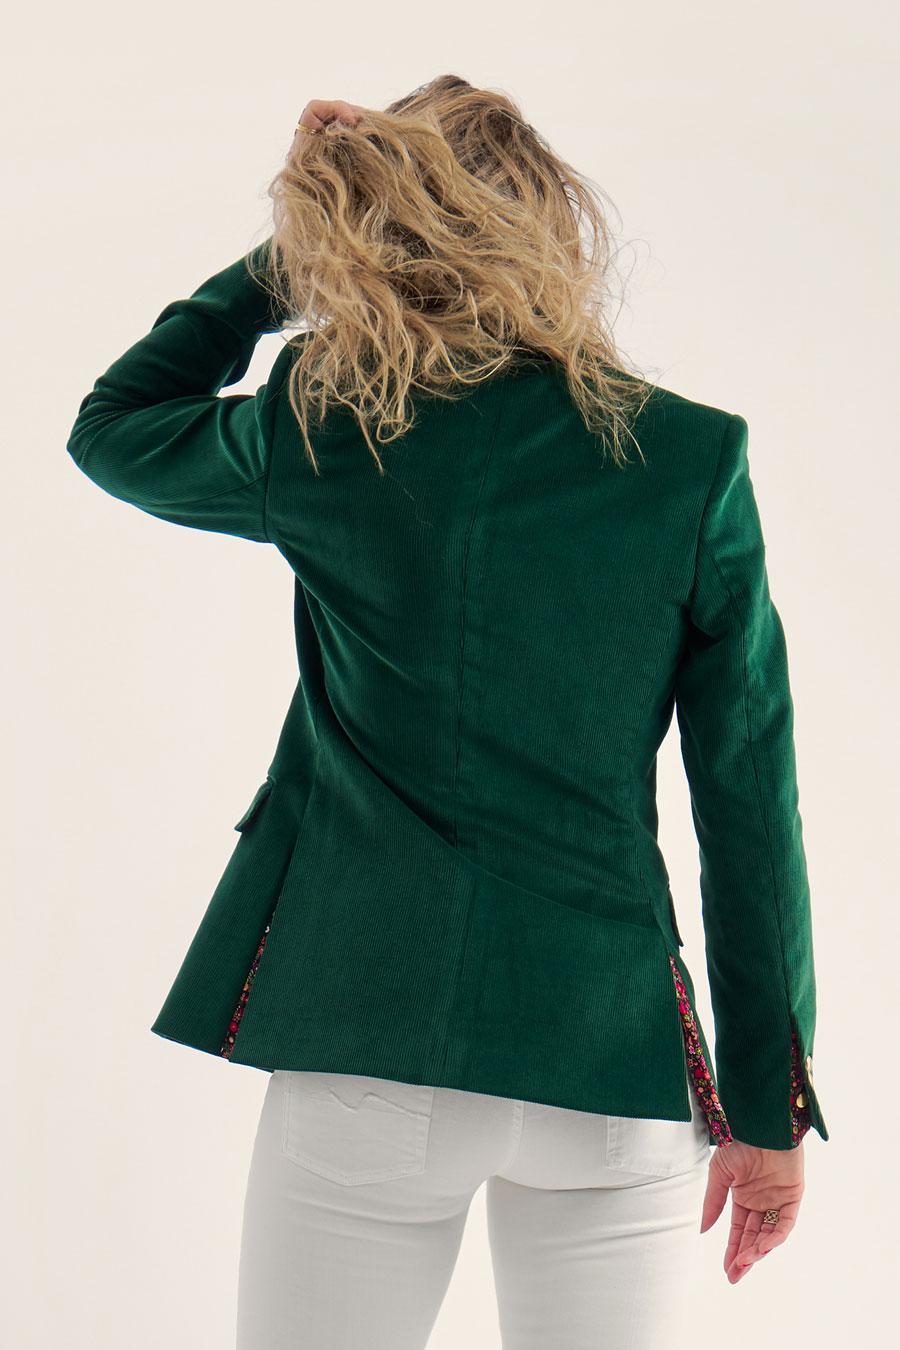 Green Corduroy Dame Jakke 5